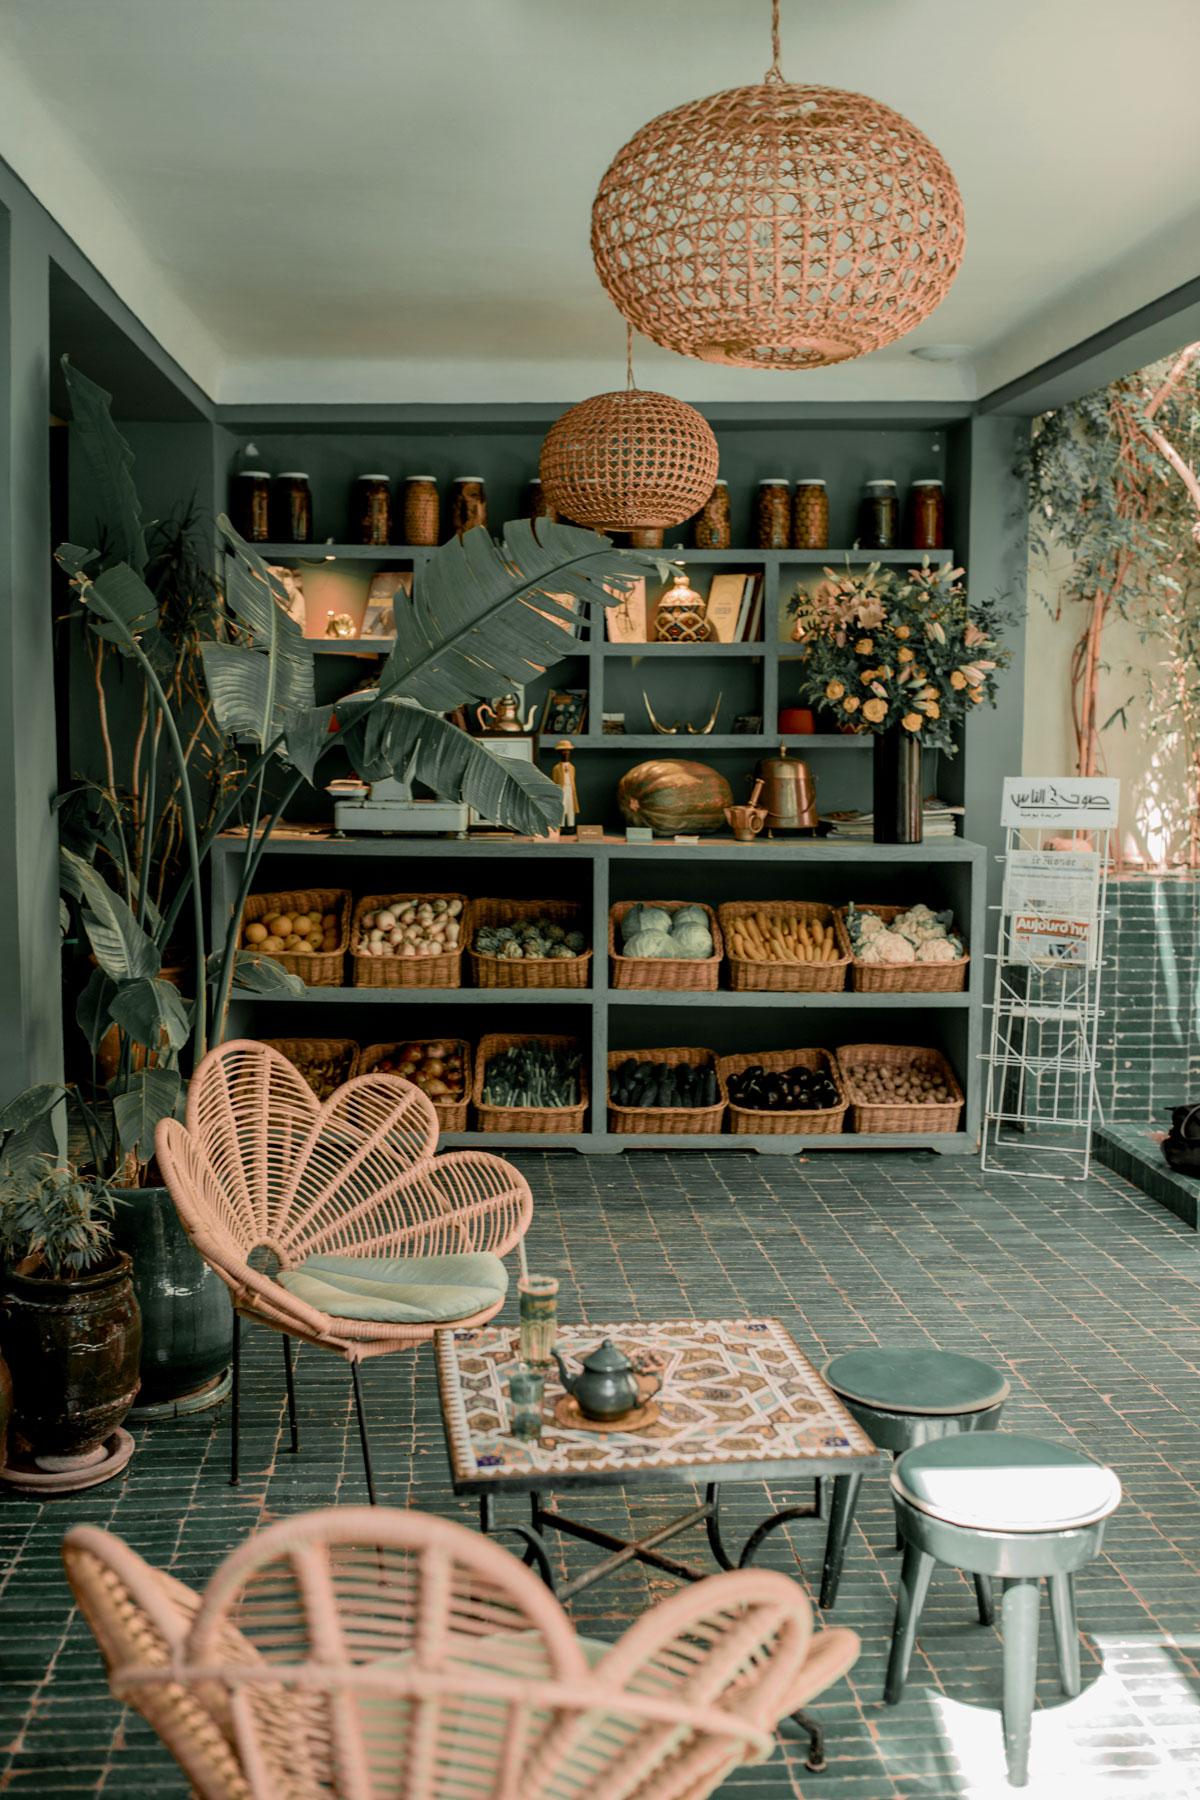 Top-things-to-do-in-marrakech-Bucket-list-kelseyinlondon-Kelsey-Heinrichs--What-to-do-in-marrakech--Where-to-go-in-marrakech-top-places-in-marrakech-Le-Jardin